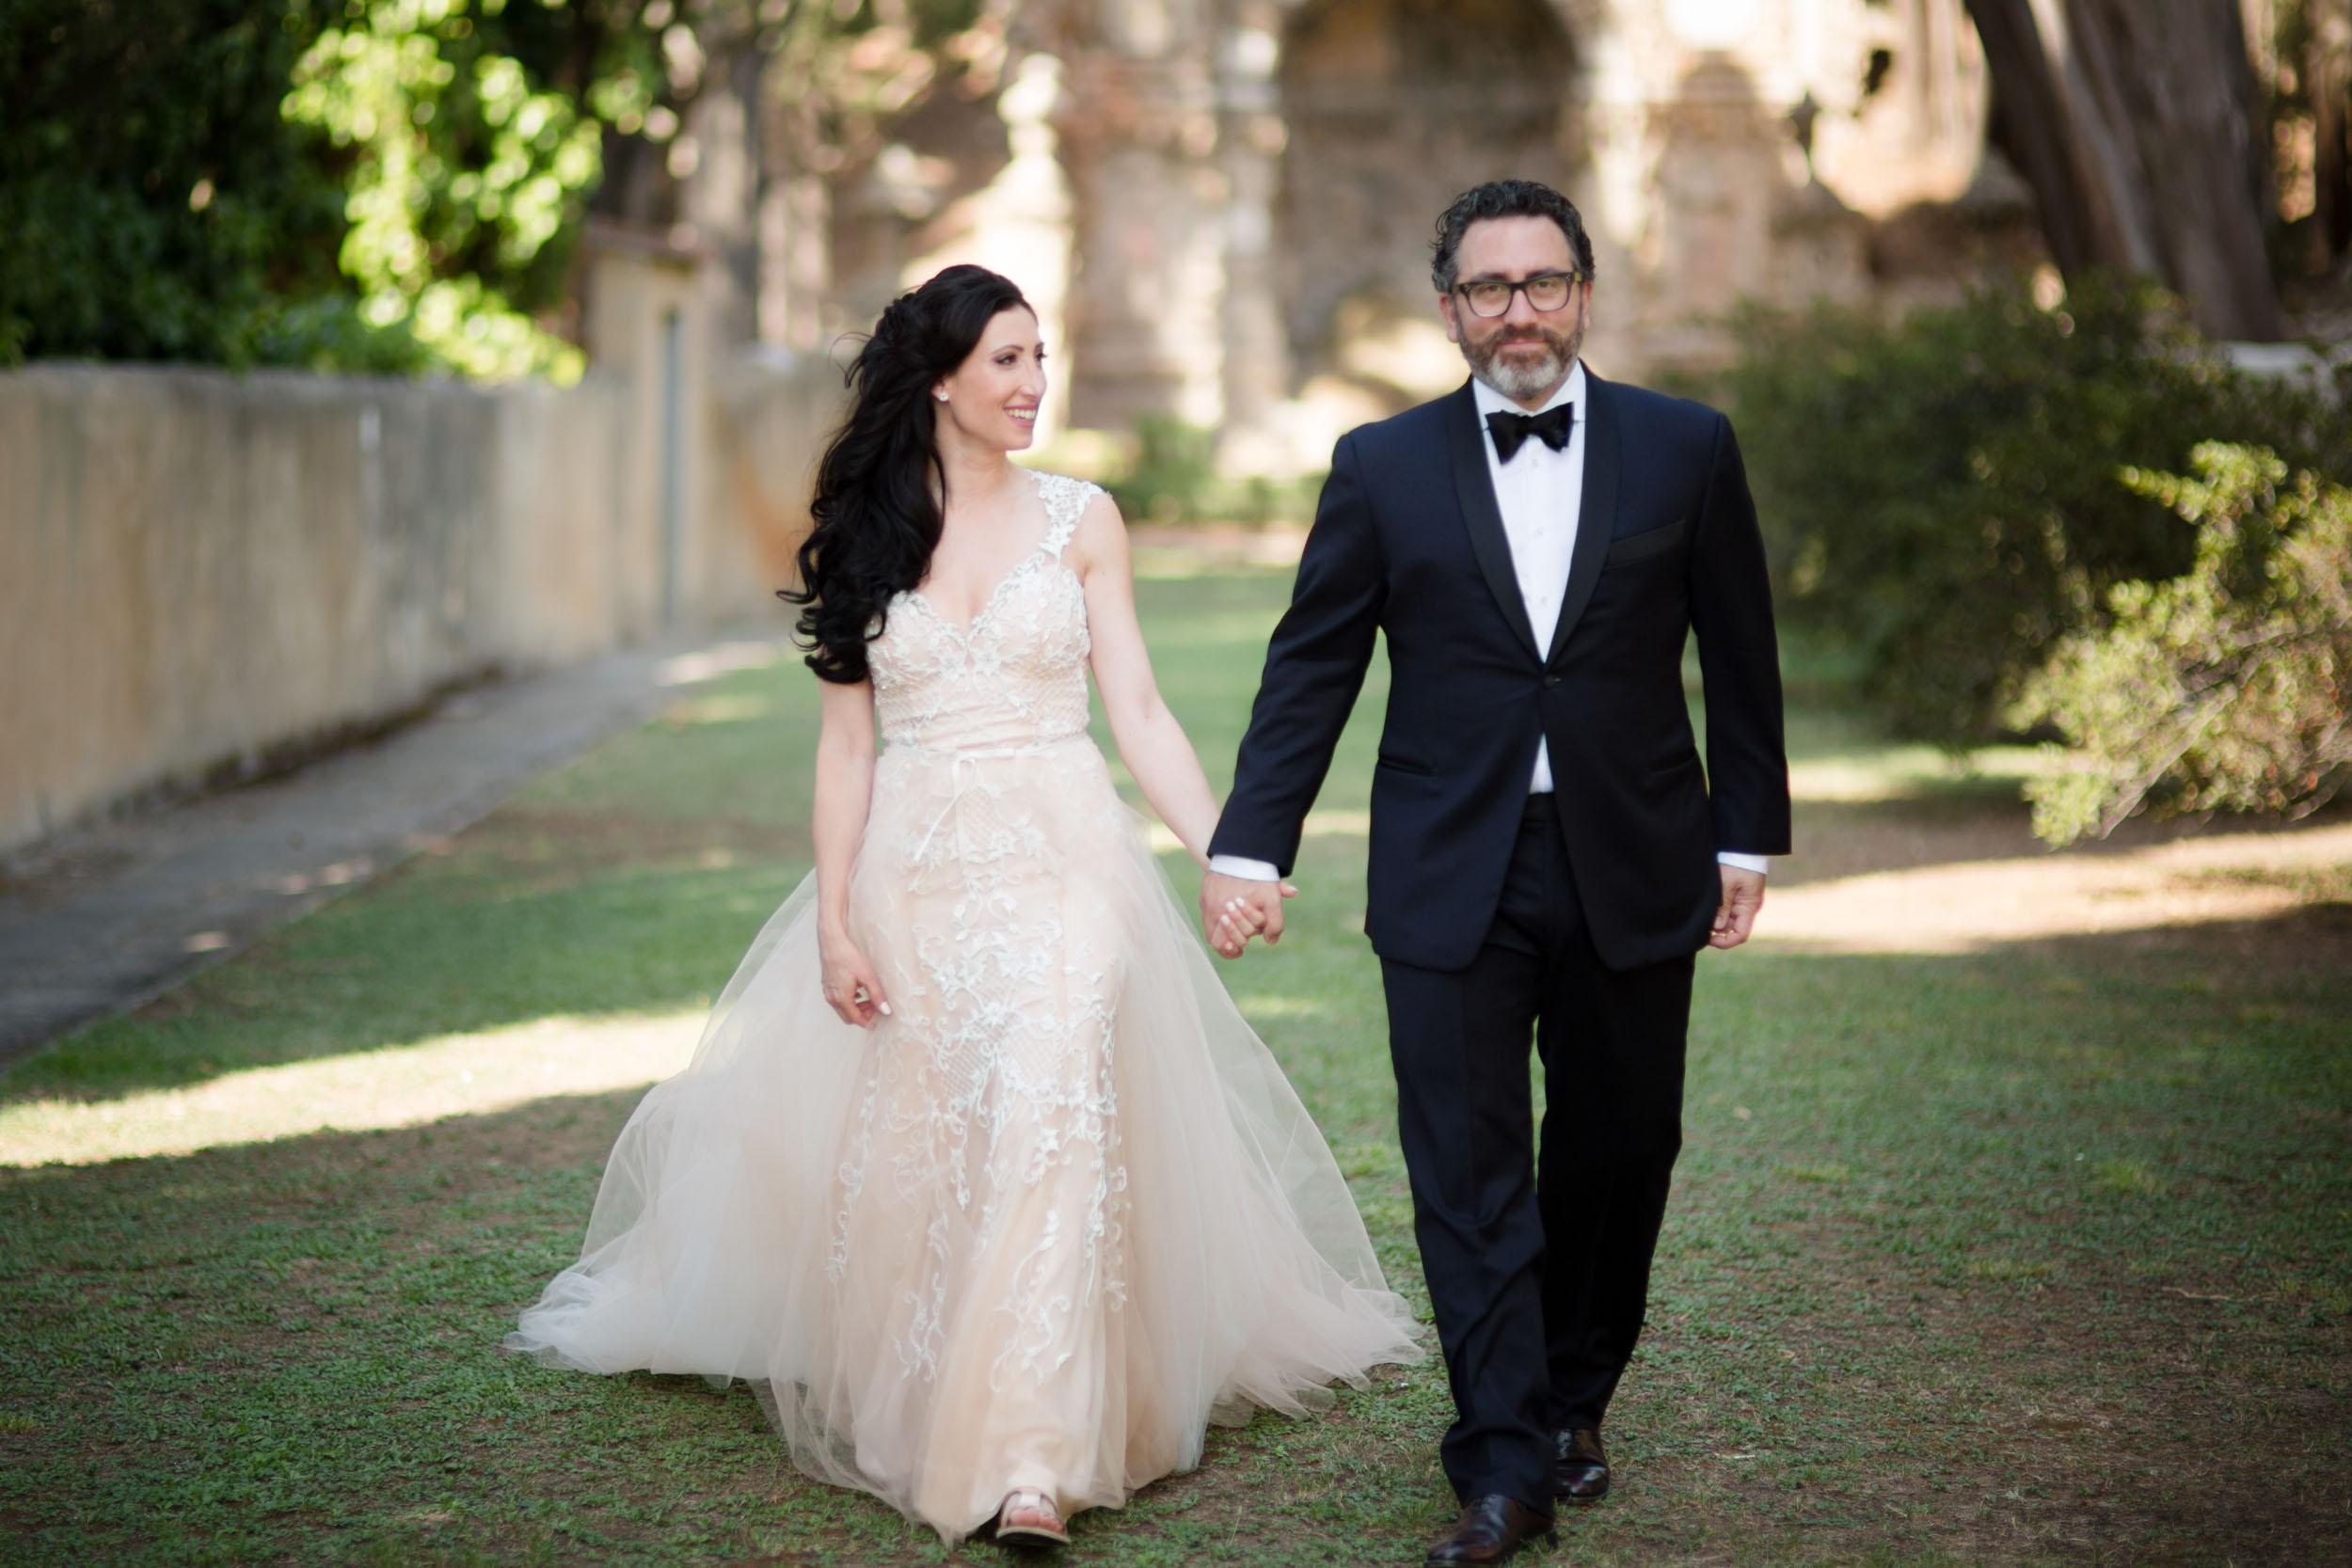 villa-gamberaia-florence-italy-destination-wedding-21.jpg